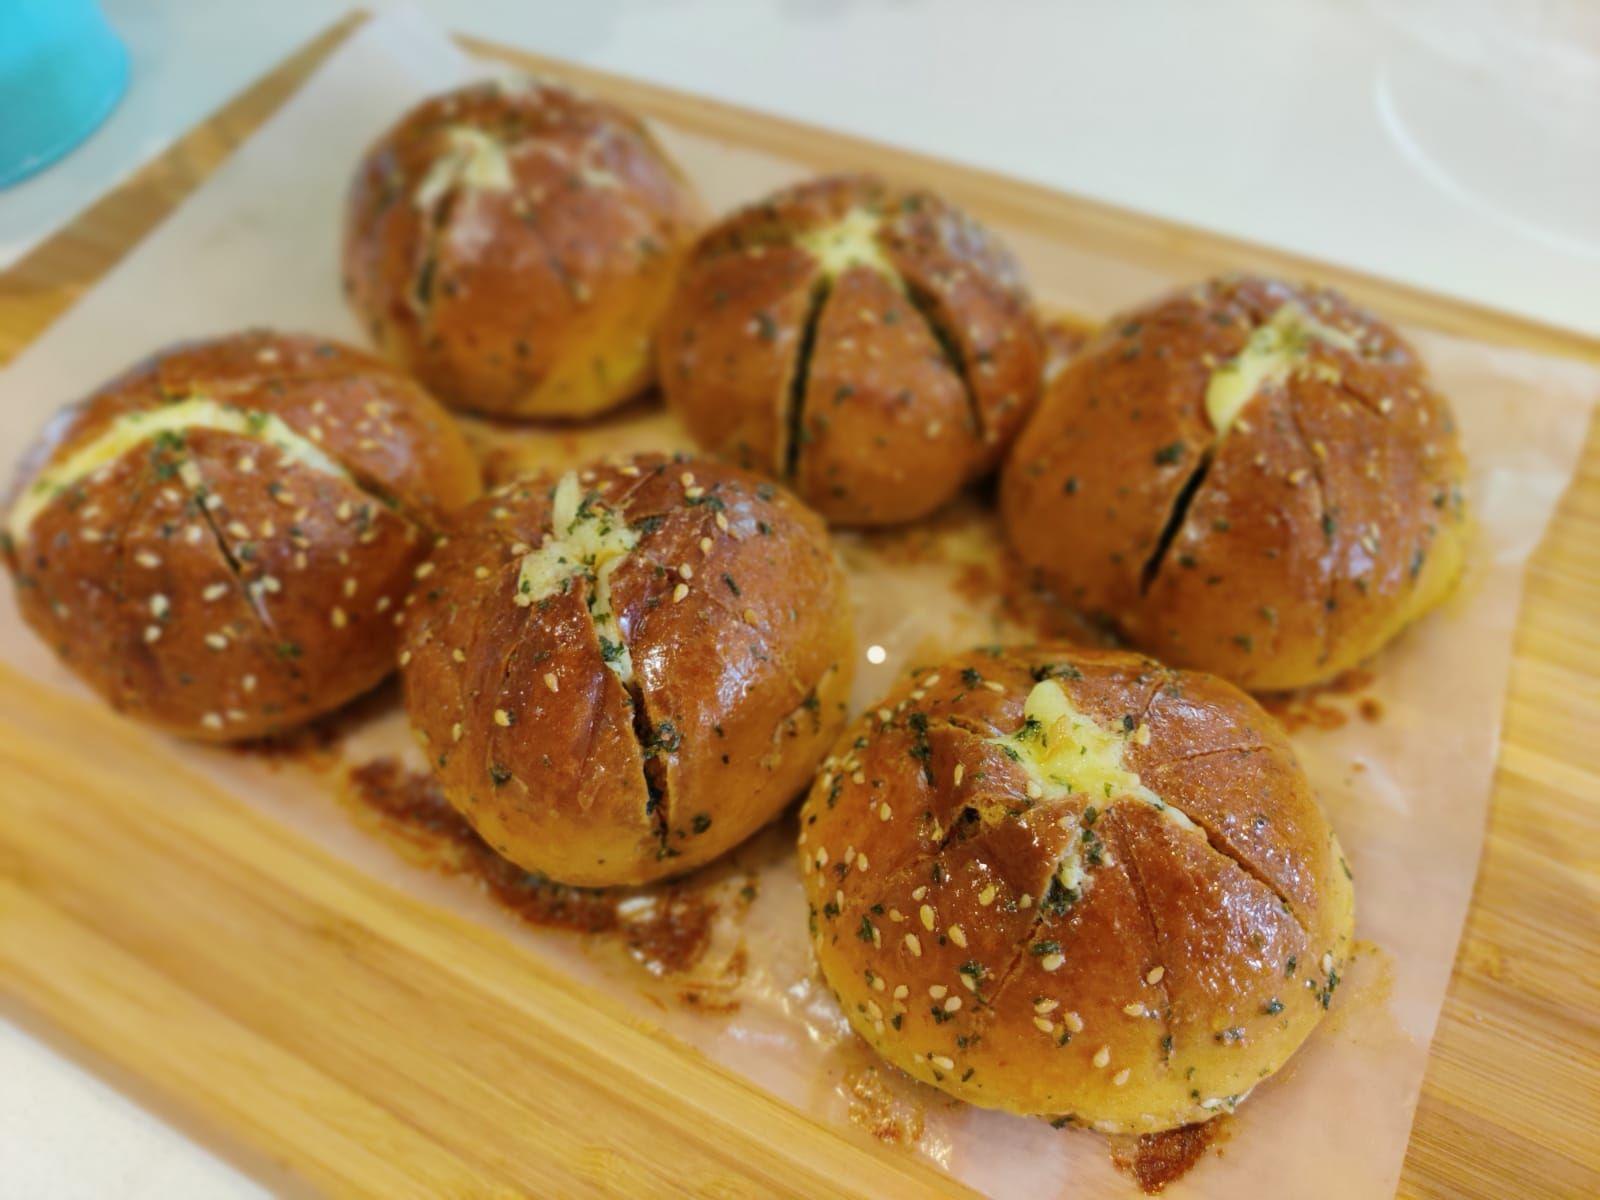 Banh Mi Bơ Tỏi Han Quốc Korean Garlic Bread In 2020 Garlic Cheese Bread Garlic Bread Korean Cream